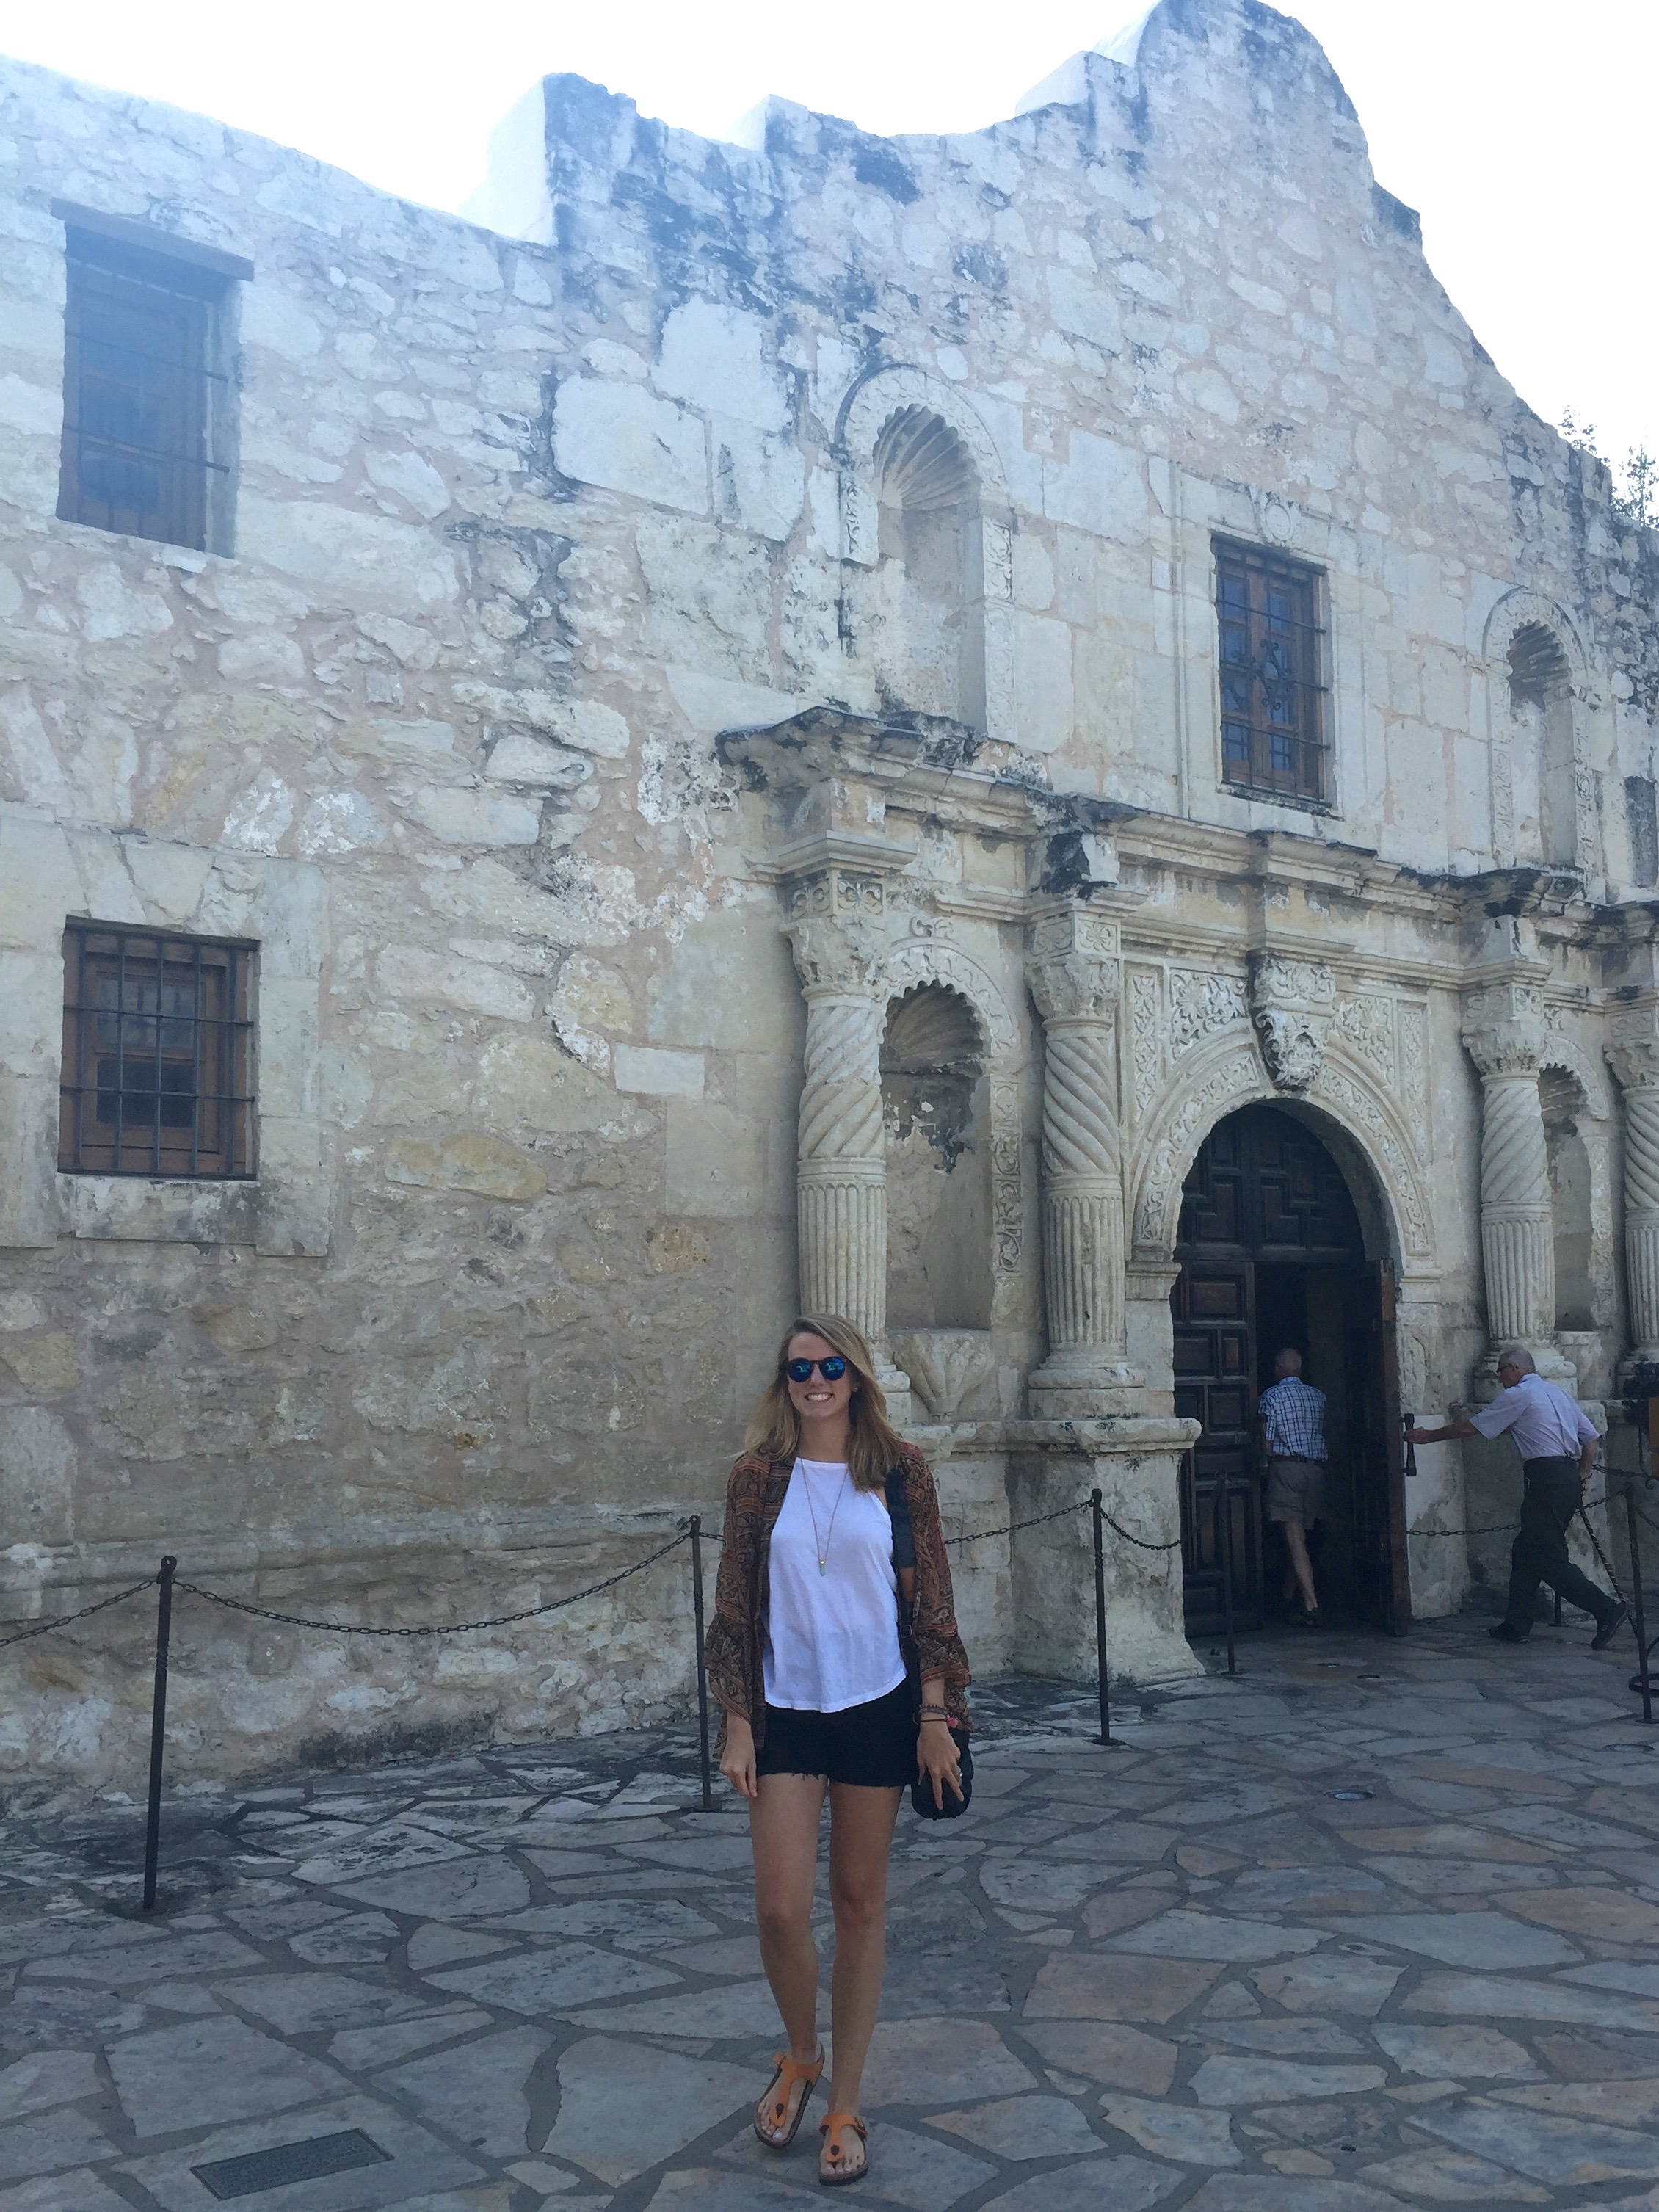 The Alamo, Mission Trail, San Antonio, Texas